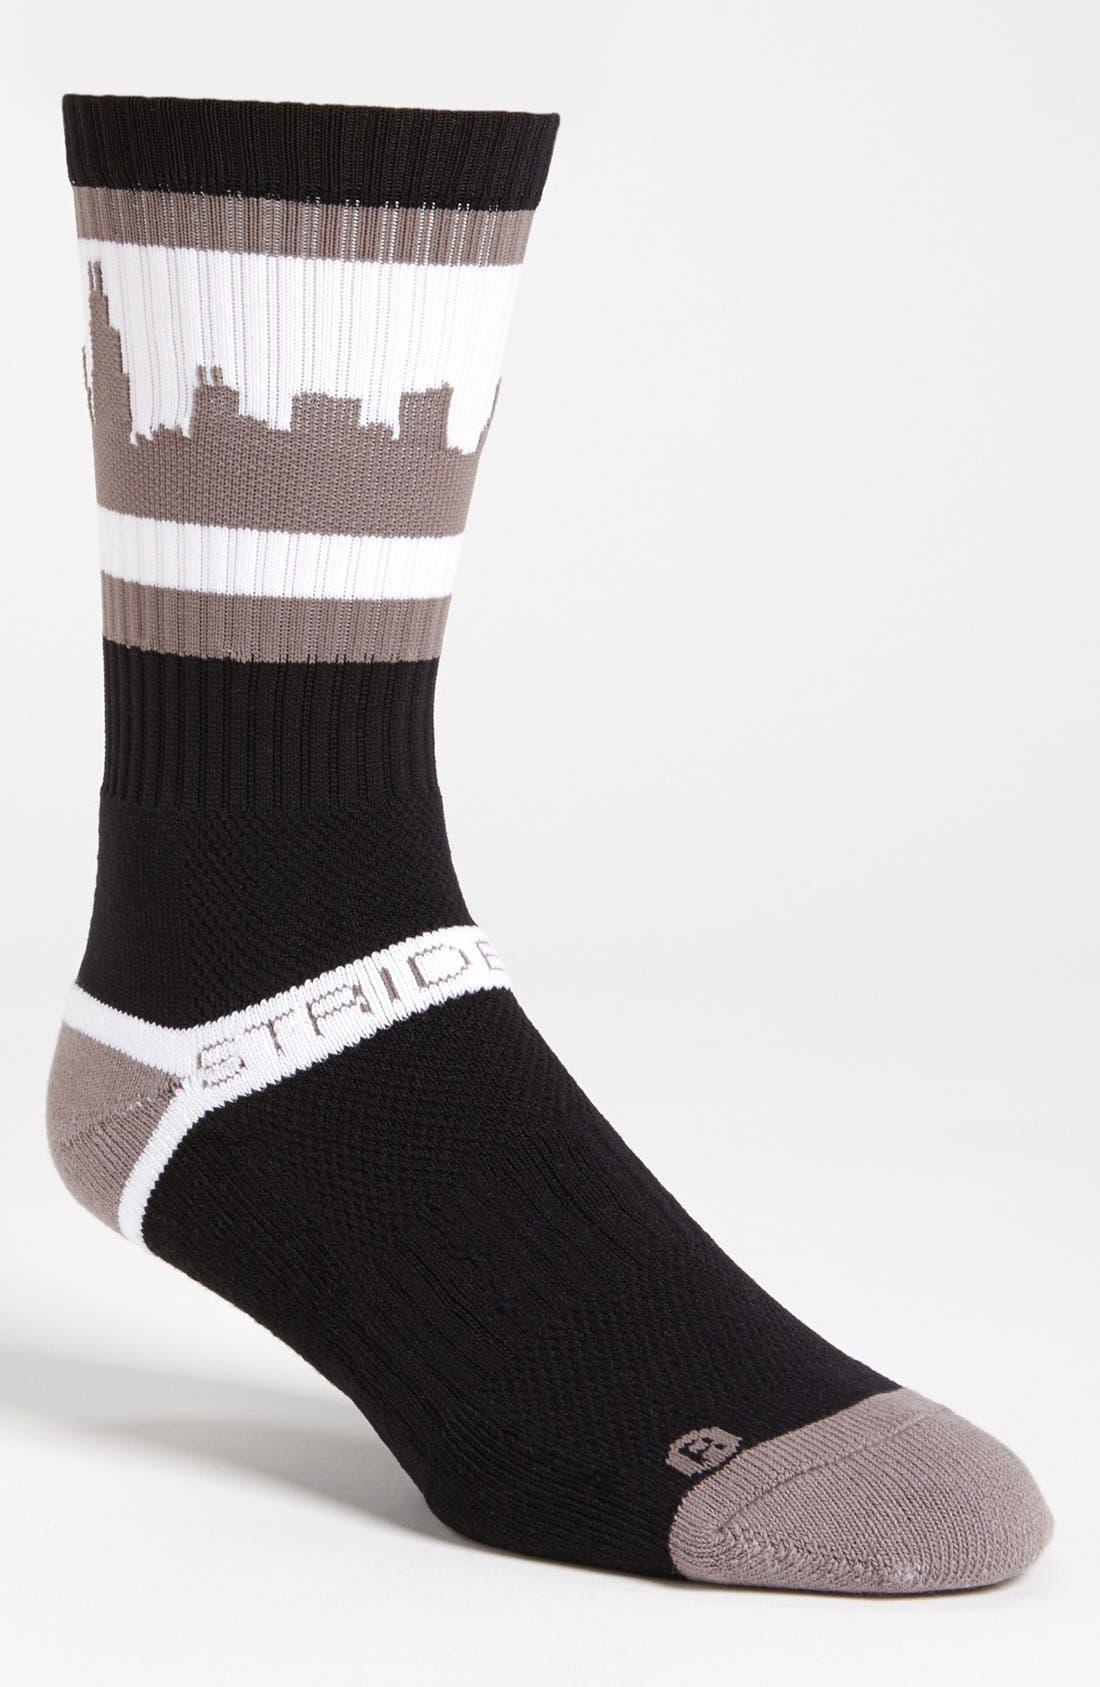 Main Image - STRIDELINE 'Chicago' Socks